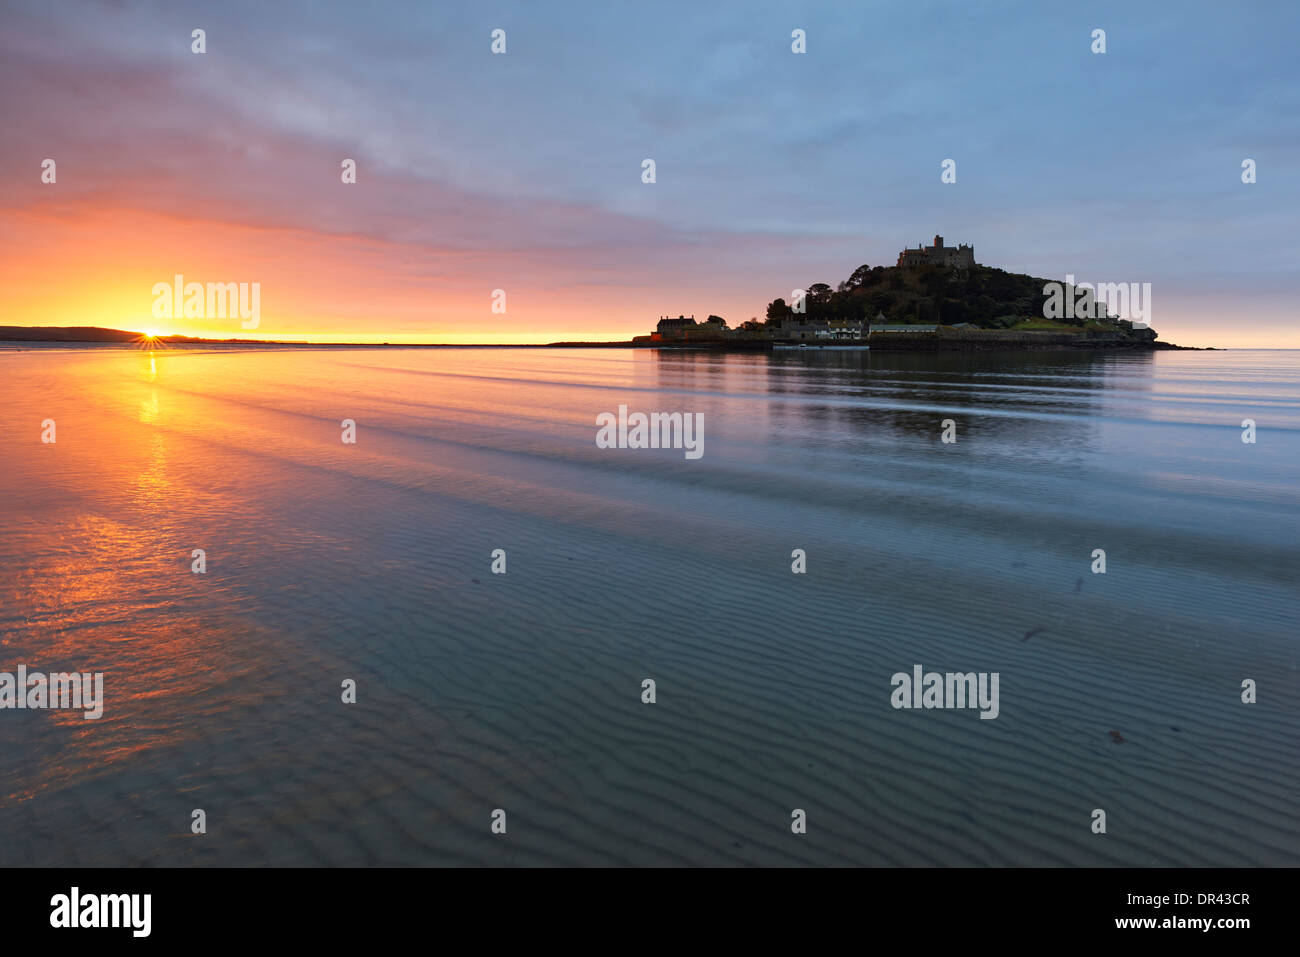 Amanecer sobre Mounts Bay y St Michael's Mount Imagen De Stock